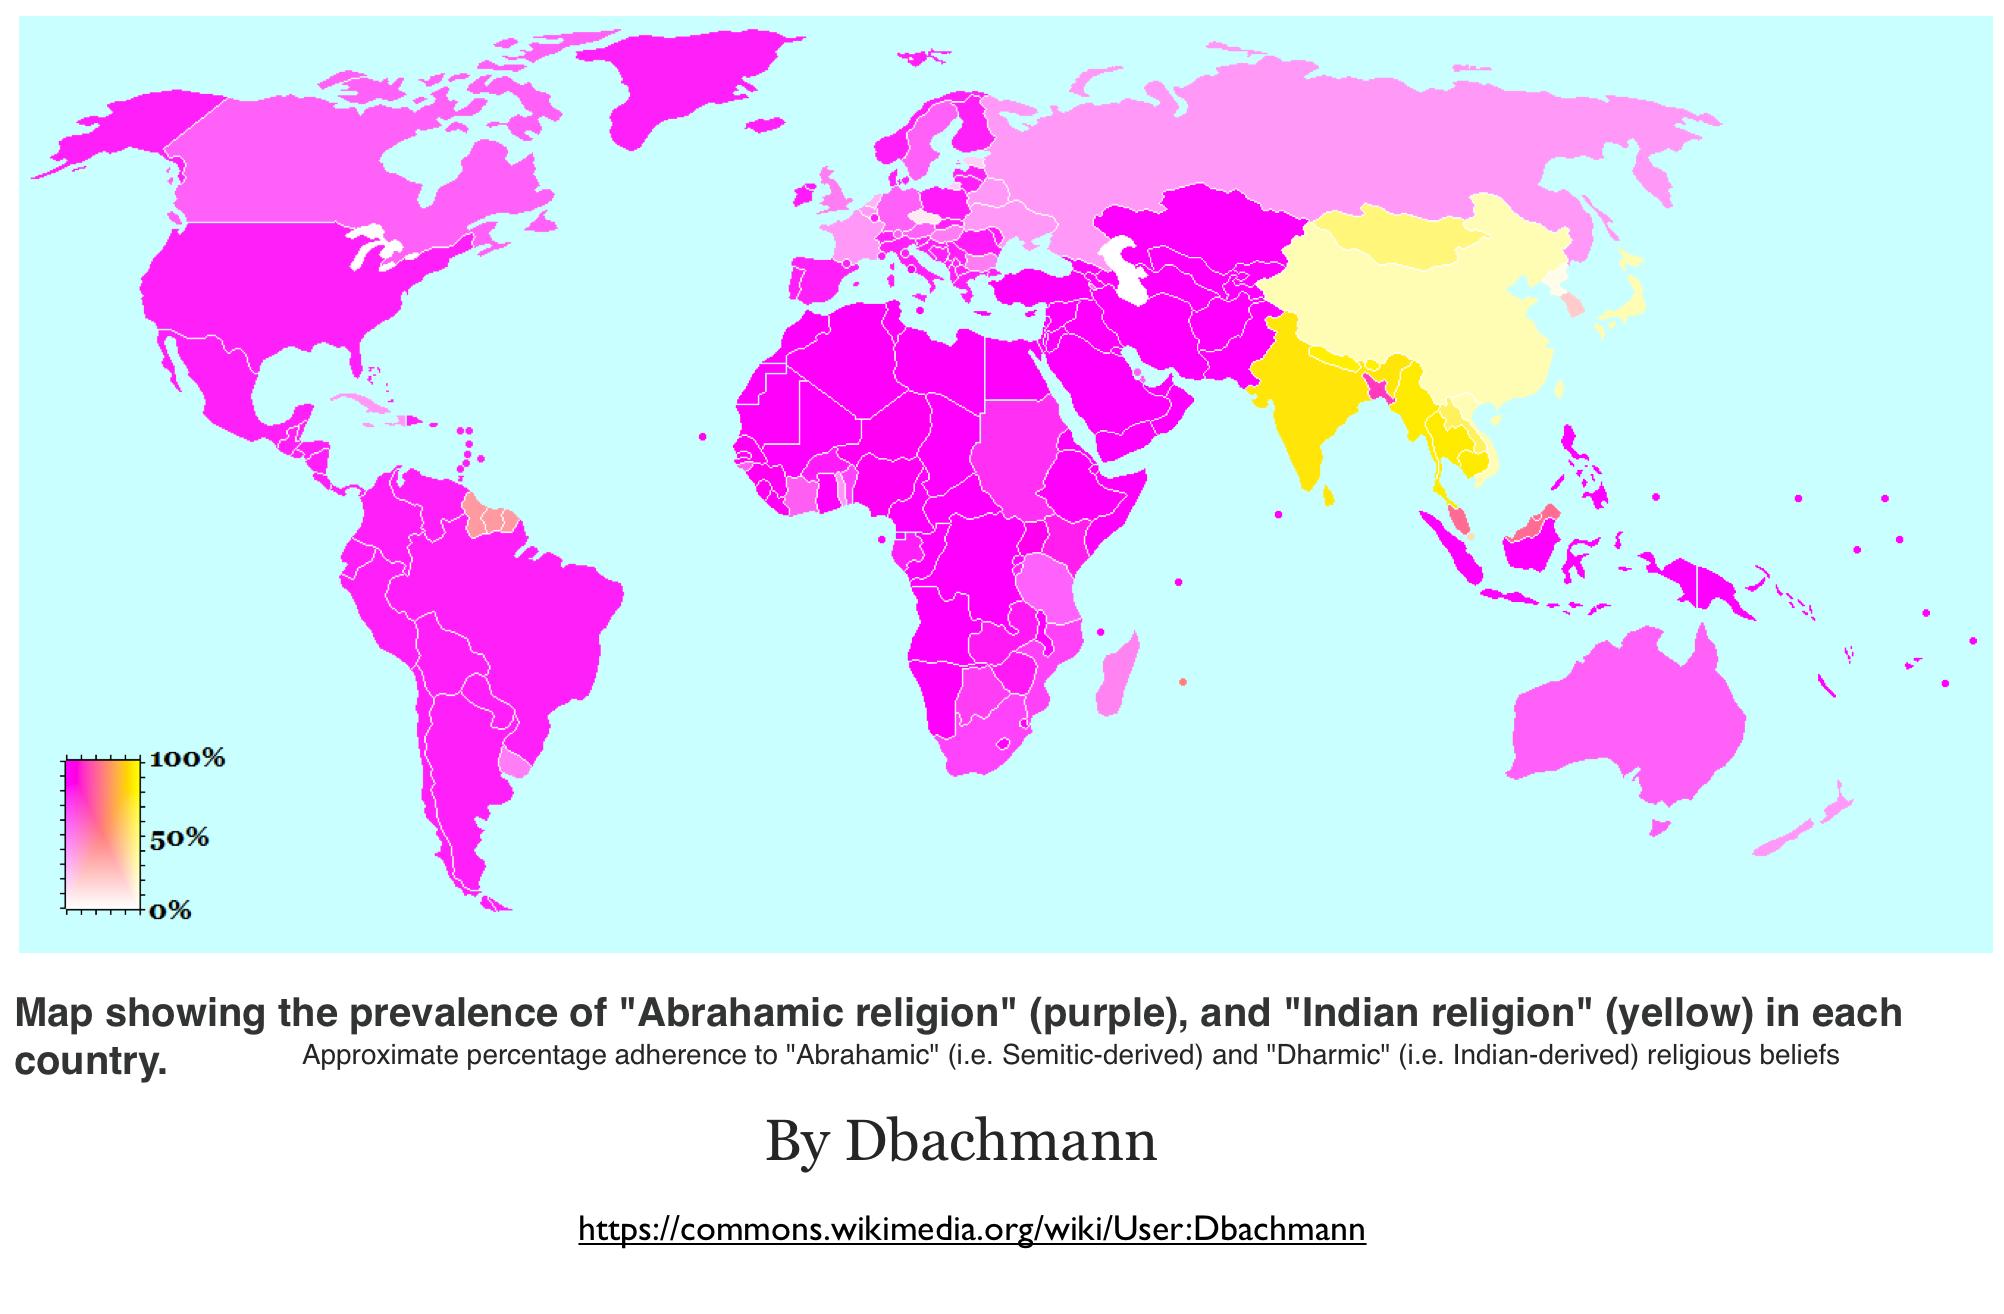 Worksheet. Innovative Wikipedia Maps of World Religion  GeoCurrents